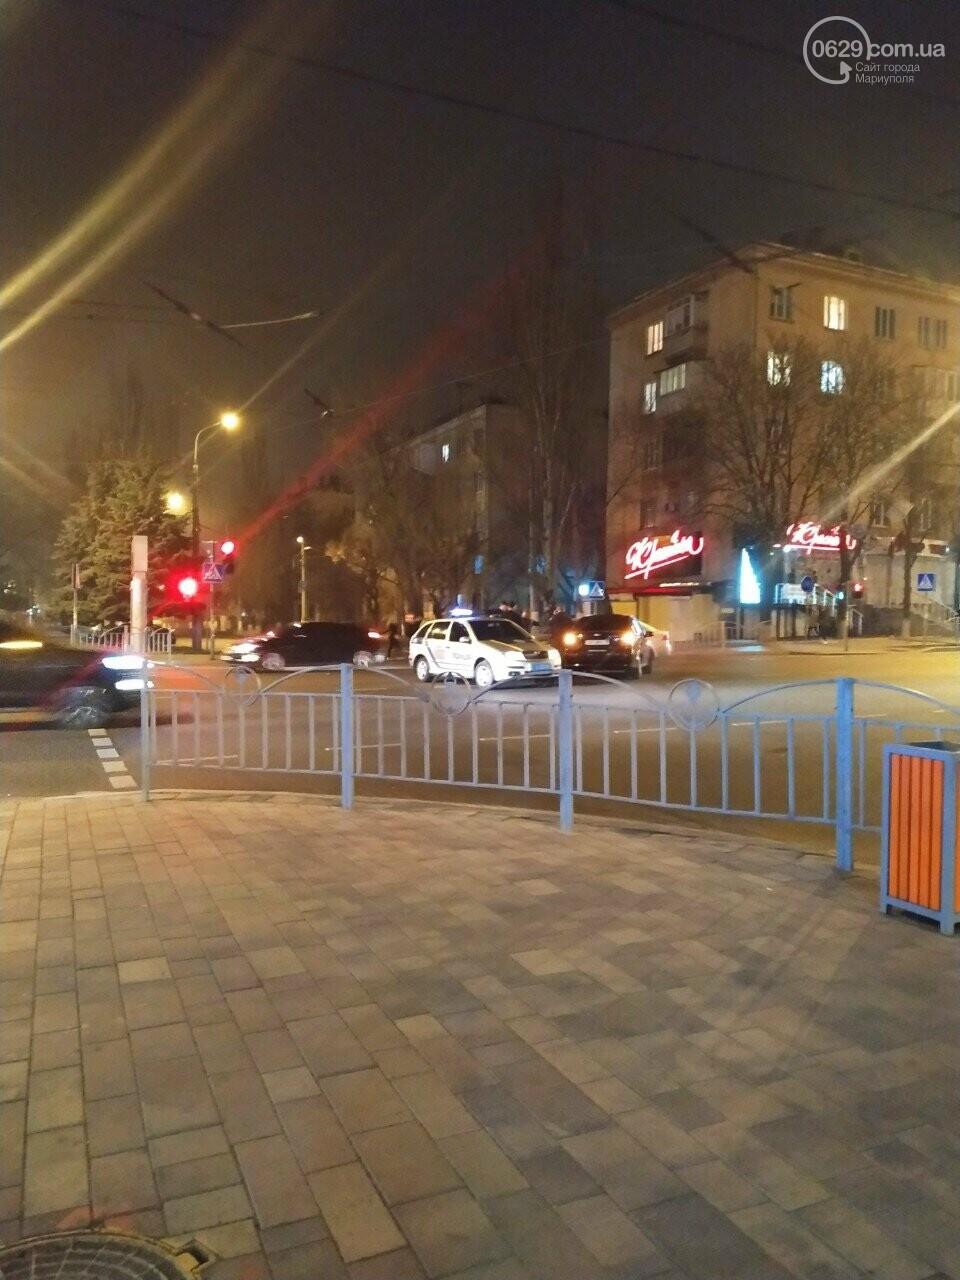 В центре Мариуполя столкнулись два автомобиля, — ФОТО, фото-7